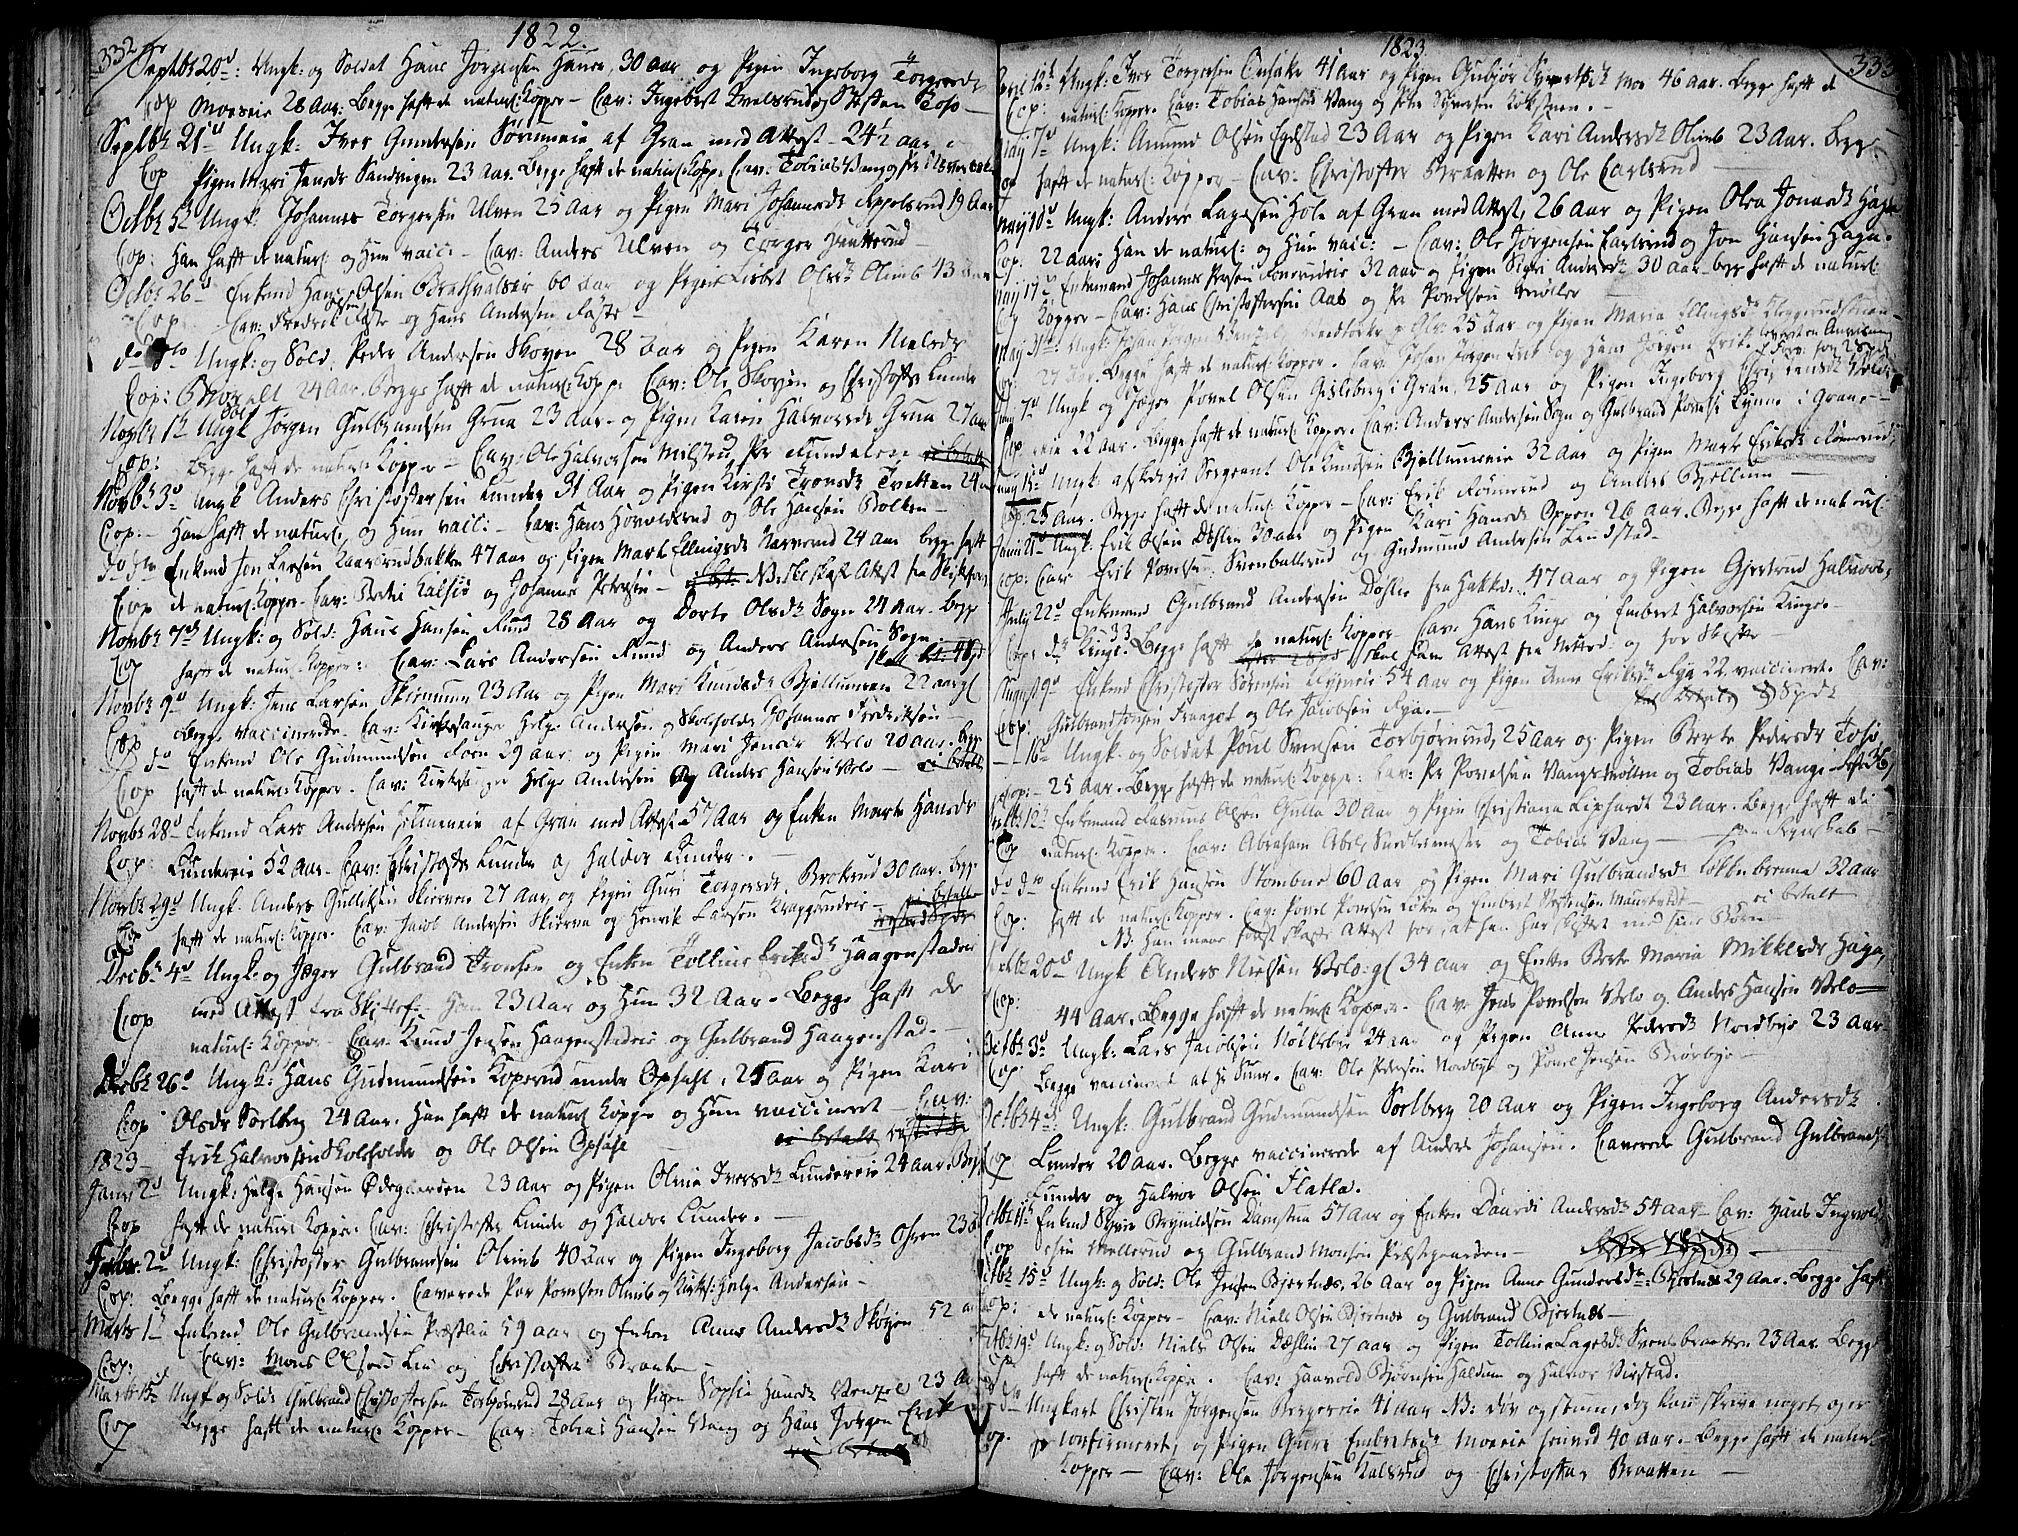 SAH, Jevnaker prestekontor, Ministerialbok nr. 4, 1800-1861, s. 332-333